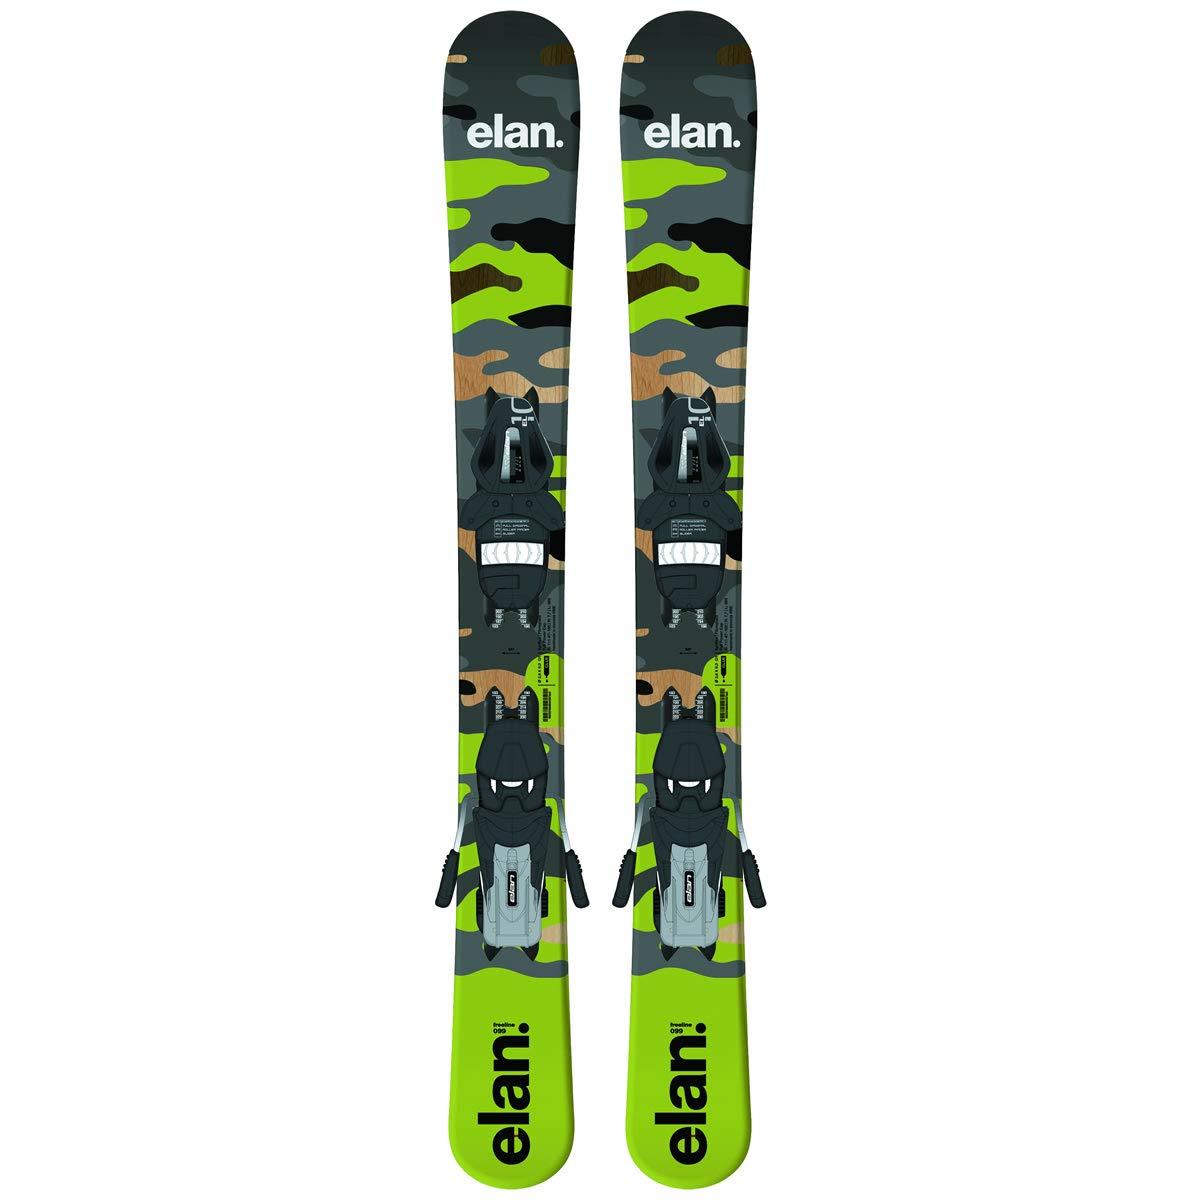 ELAN(エラン) スキーボード 2020 FREELINE CAMO 99cm + EL10.0 SHIFT GW WB90 調整式ビンディング付 フリーライン ファンスキー 19-20 elan スキー板 【L1】